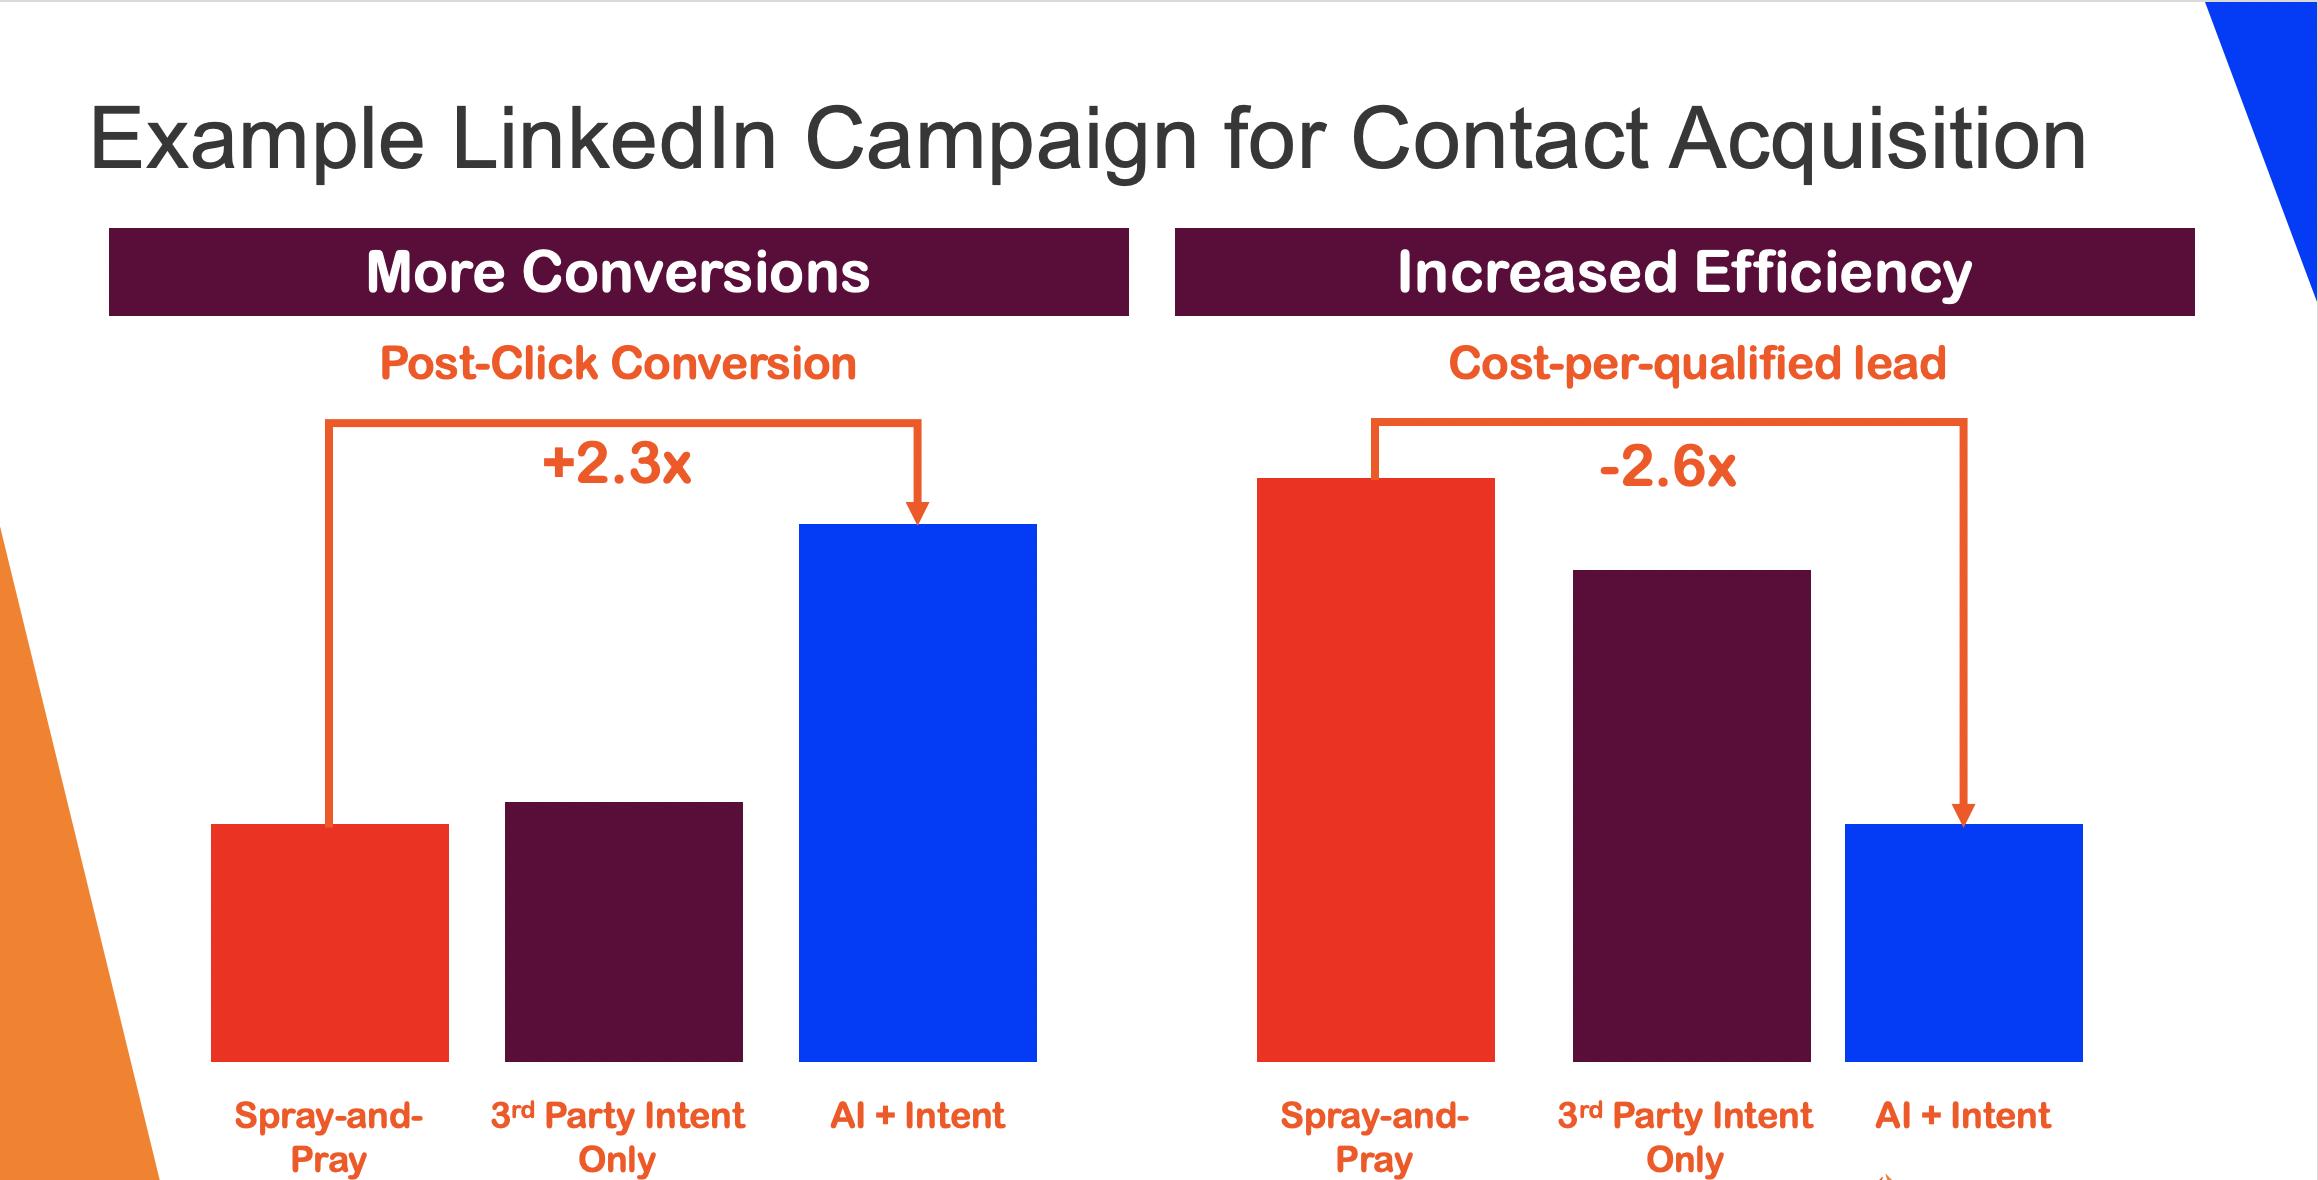 LinkedIn Campaign run using Standard LinkedIn targeting data, Intent data and AI + Intent data